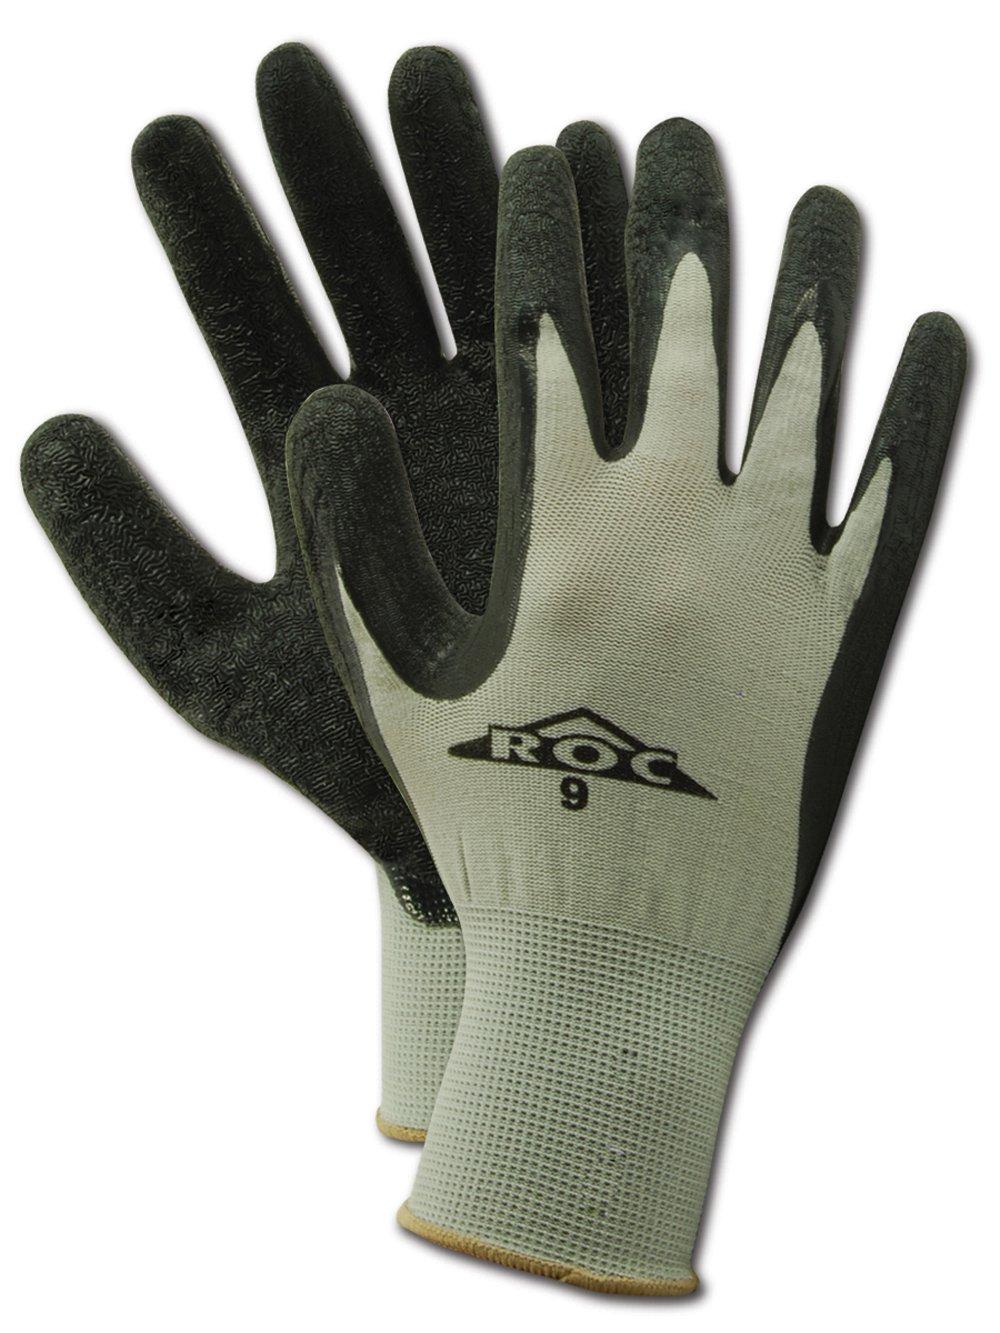 MAGID ROC GP190 Nylon Glove, Black Latex Palm Coating, Knit Wrist Cuff, 10.5